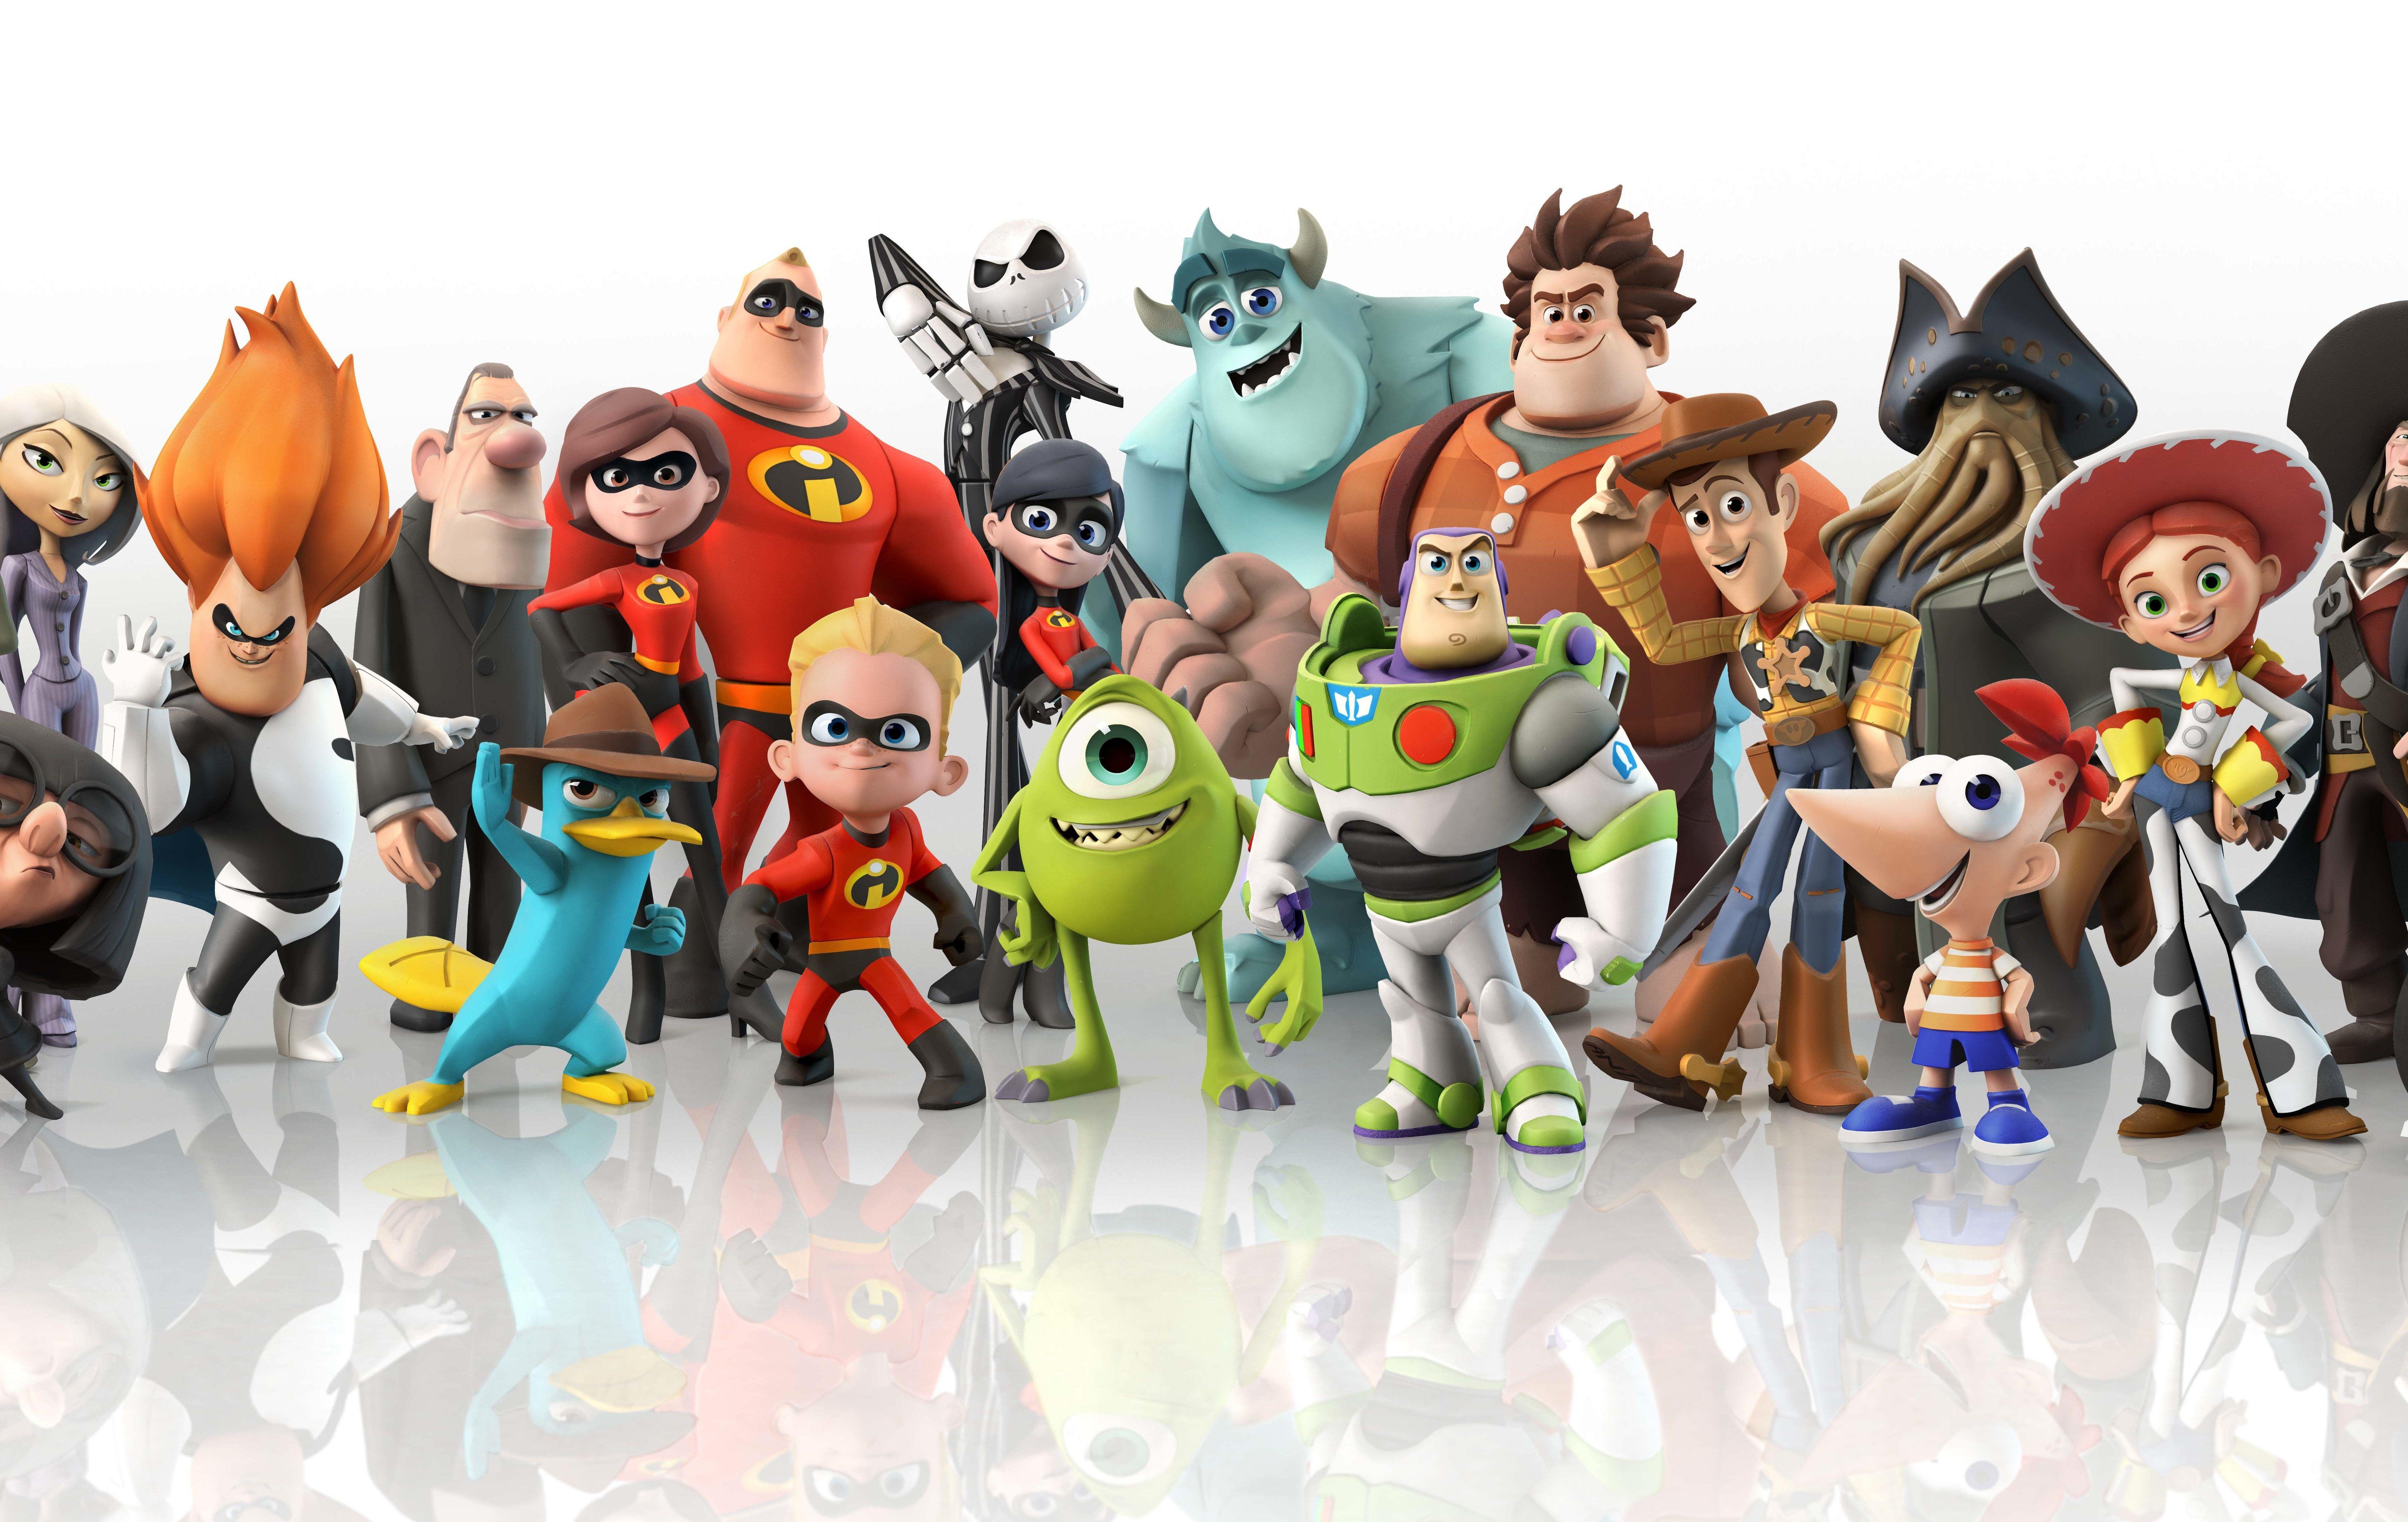 Action Adventure Animation Disney Disney Infinity Family Infinity Marvel Sandbox Superhero 5k Disney Infinity Disney Infinity Figures Storytelling